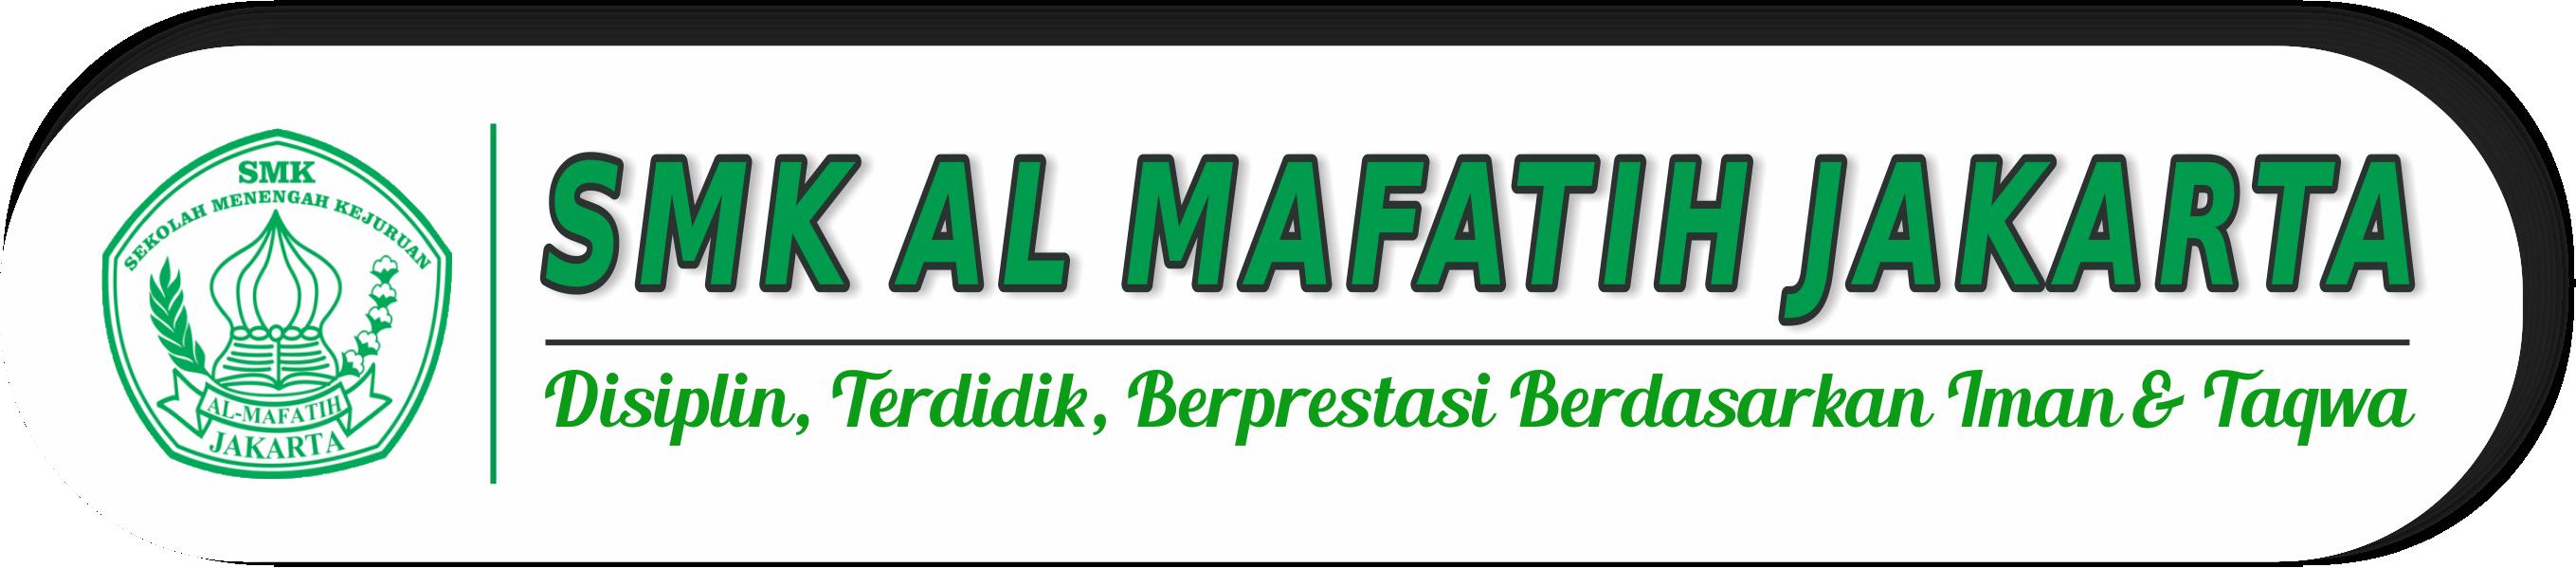 SMK AL MAFATIH JAKARTA